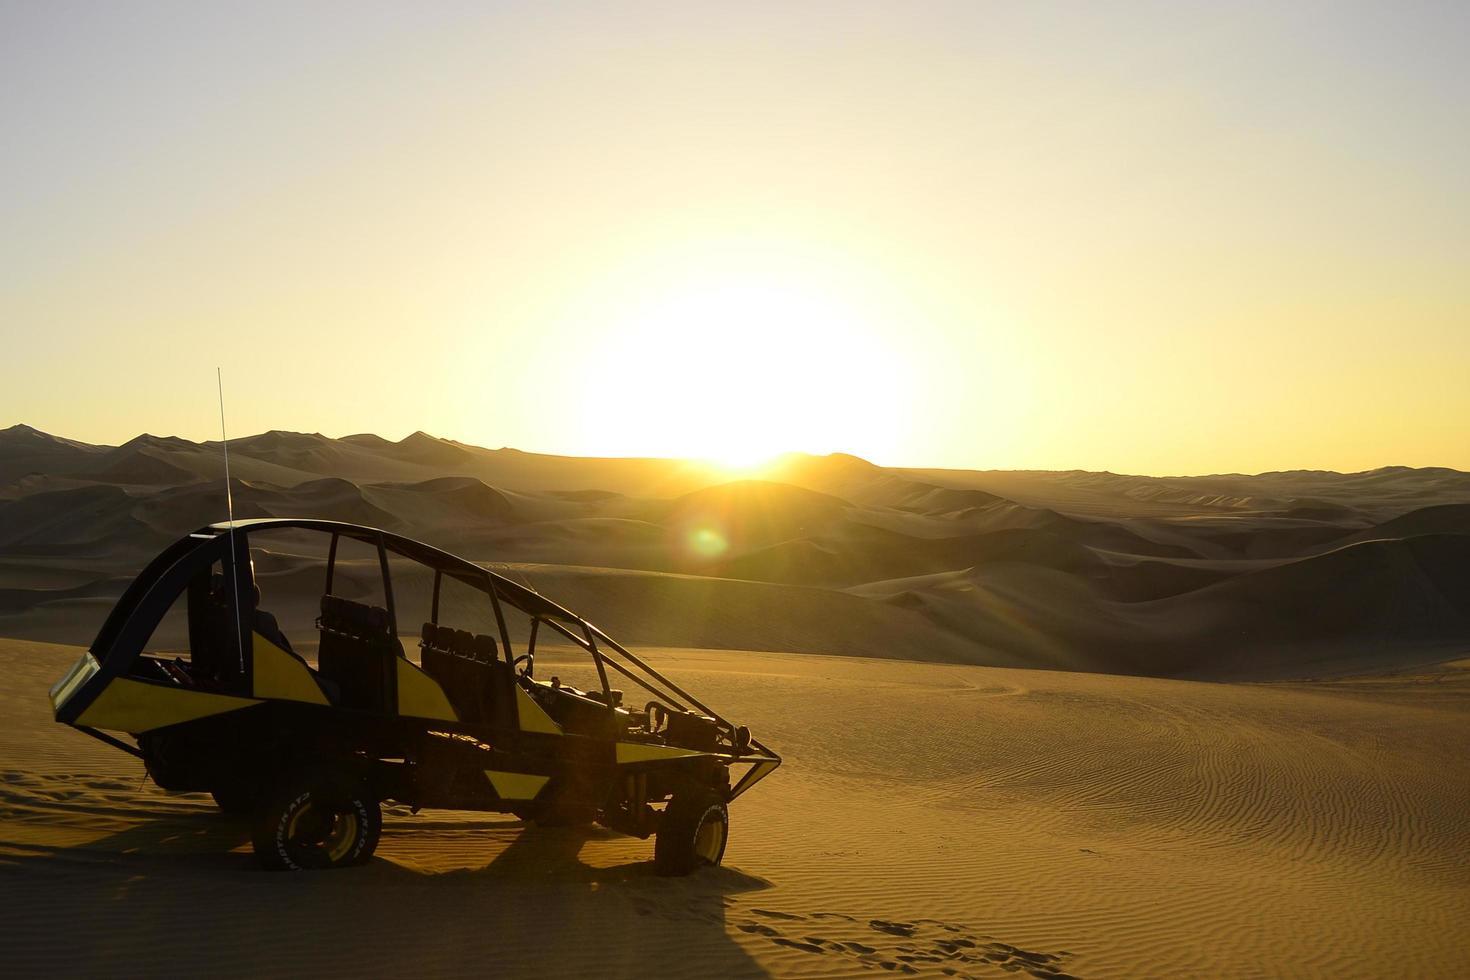 Buggy in der Wüste foto